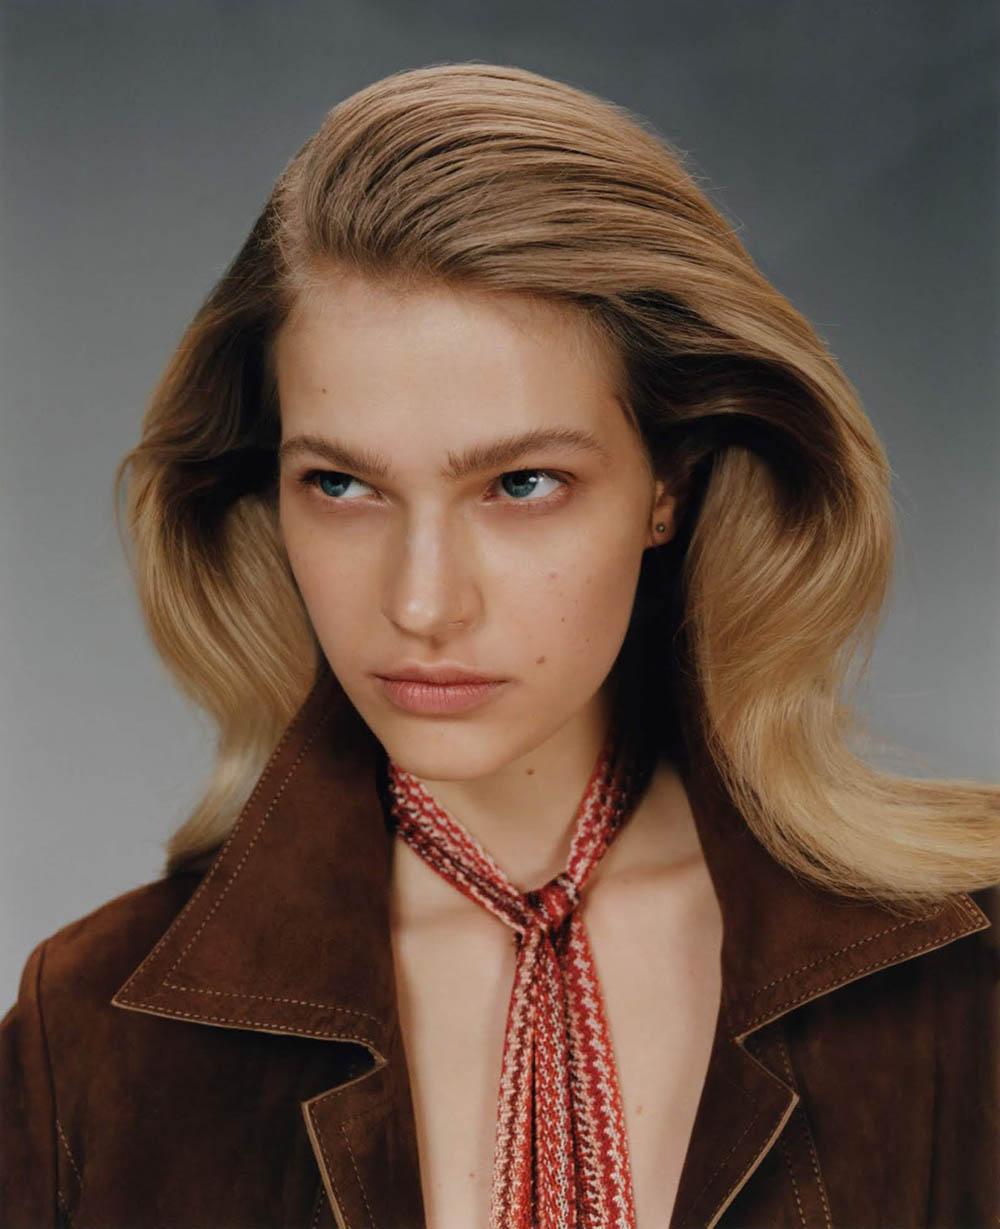 Aivita Mūze by Marcin Kempski for Vogue Poland April 2020